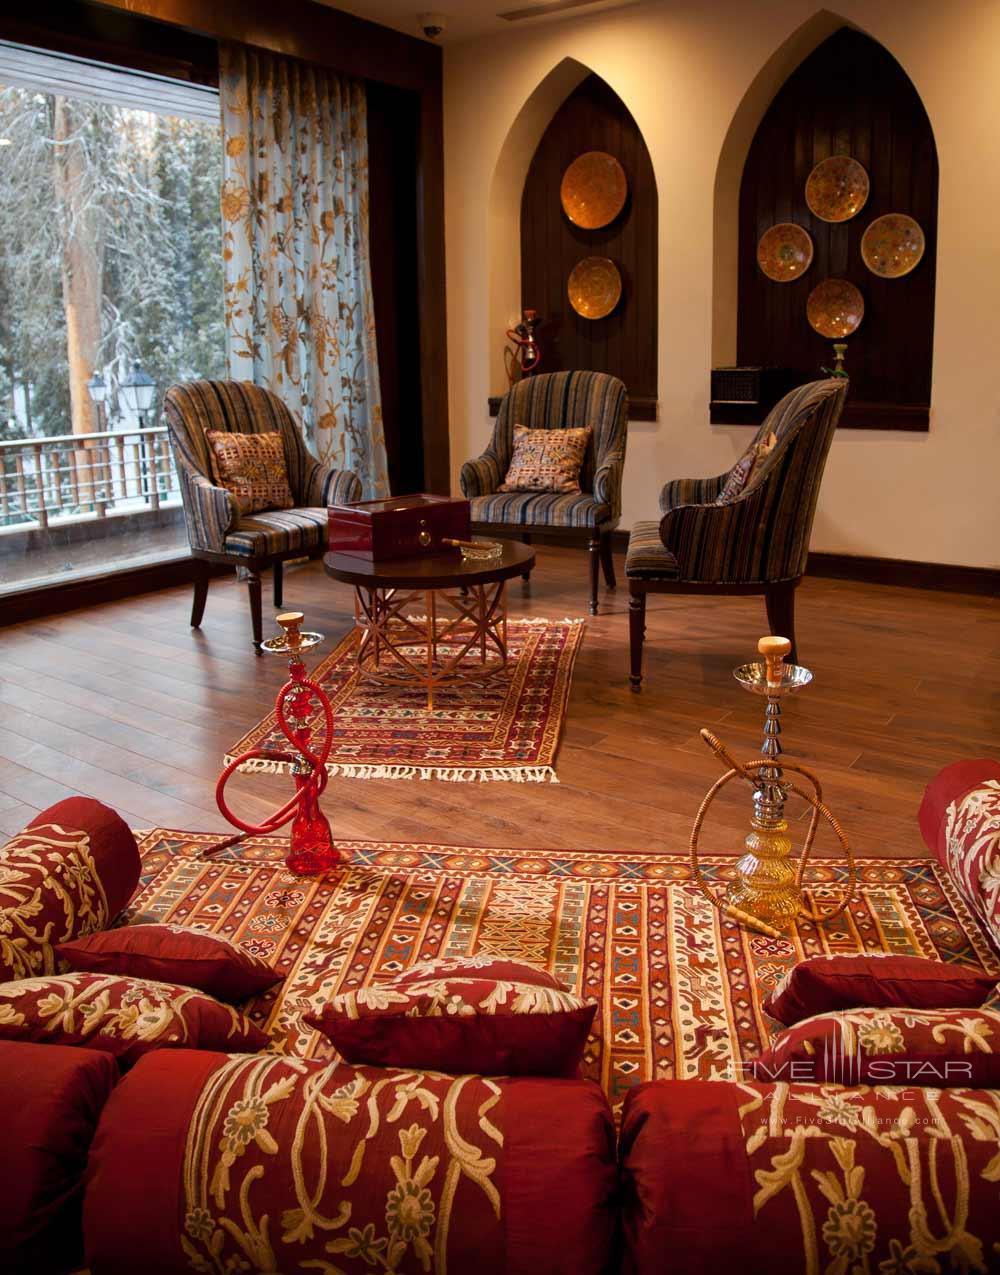 Sitting Room at Khyber Himalayan Resort and Spa